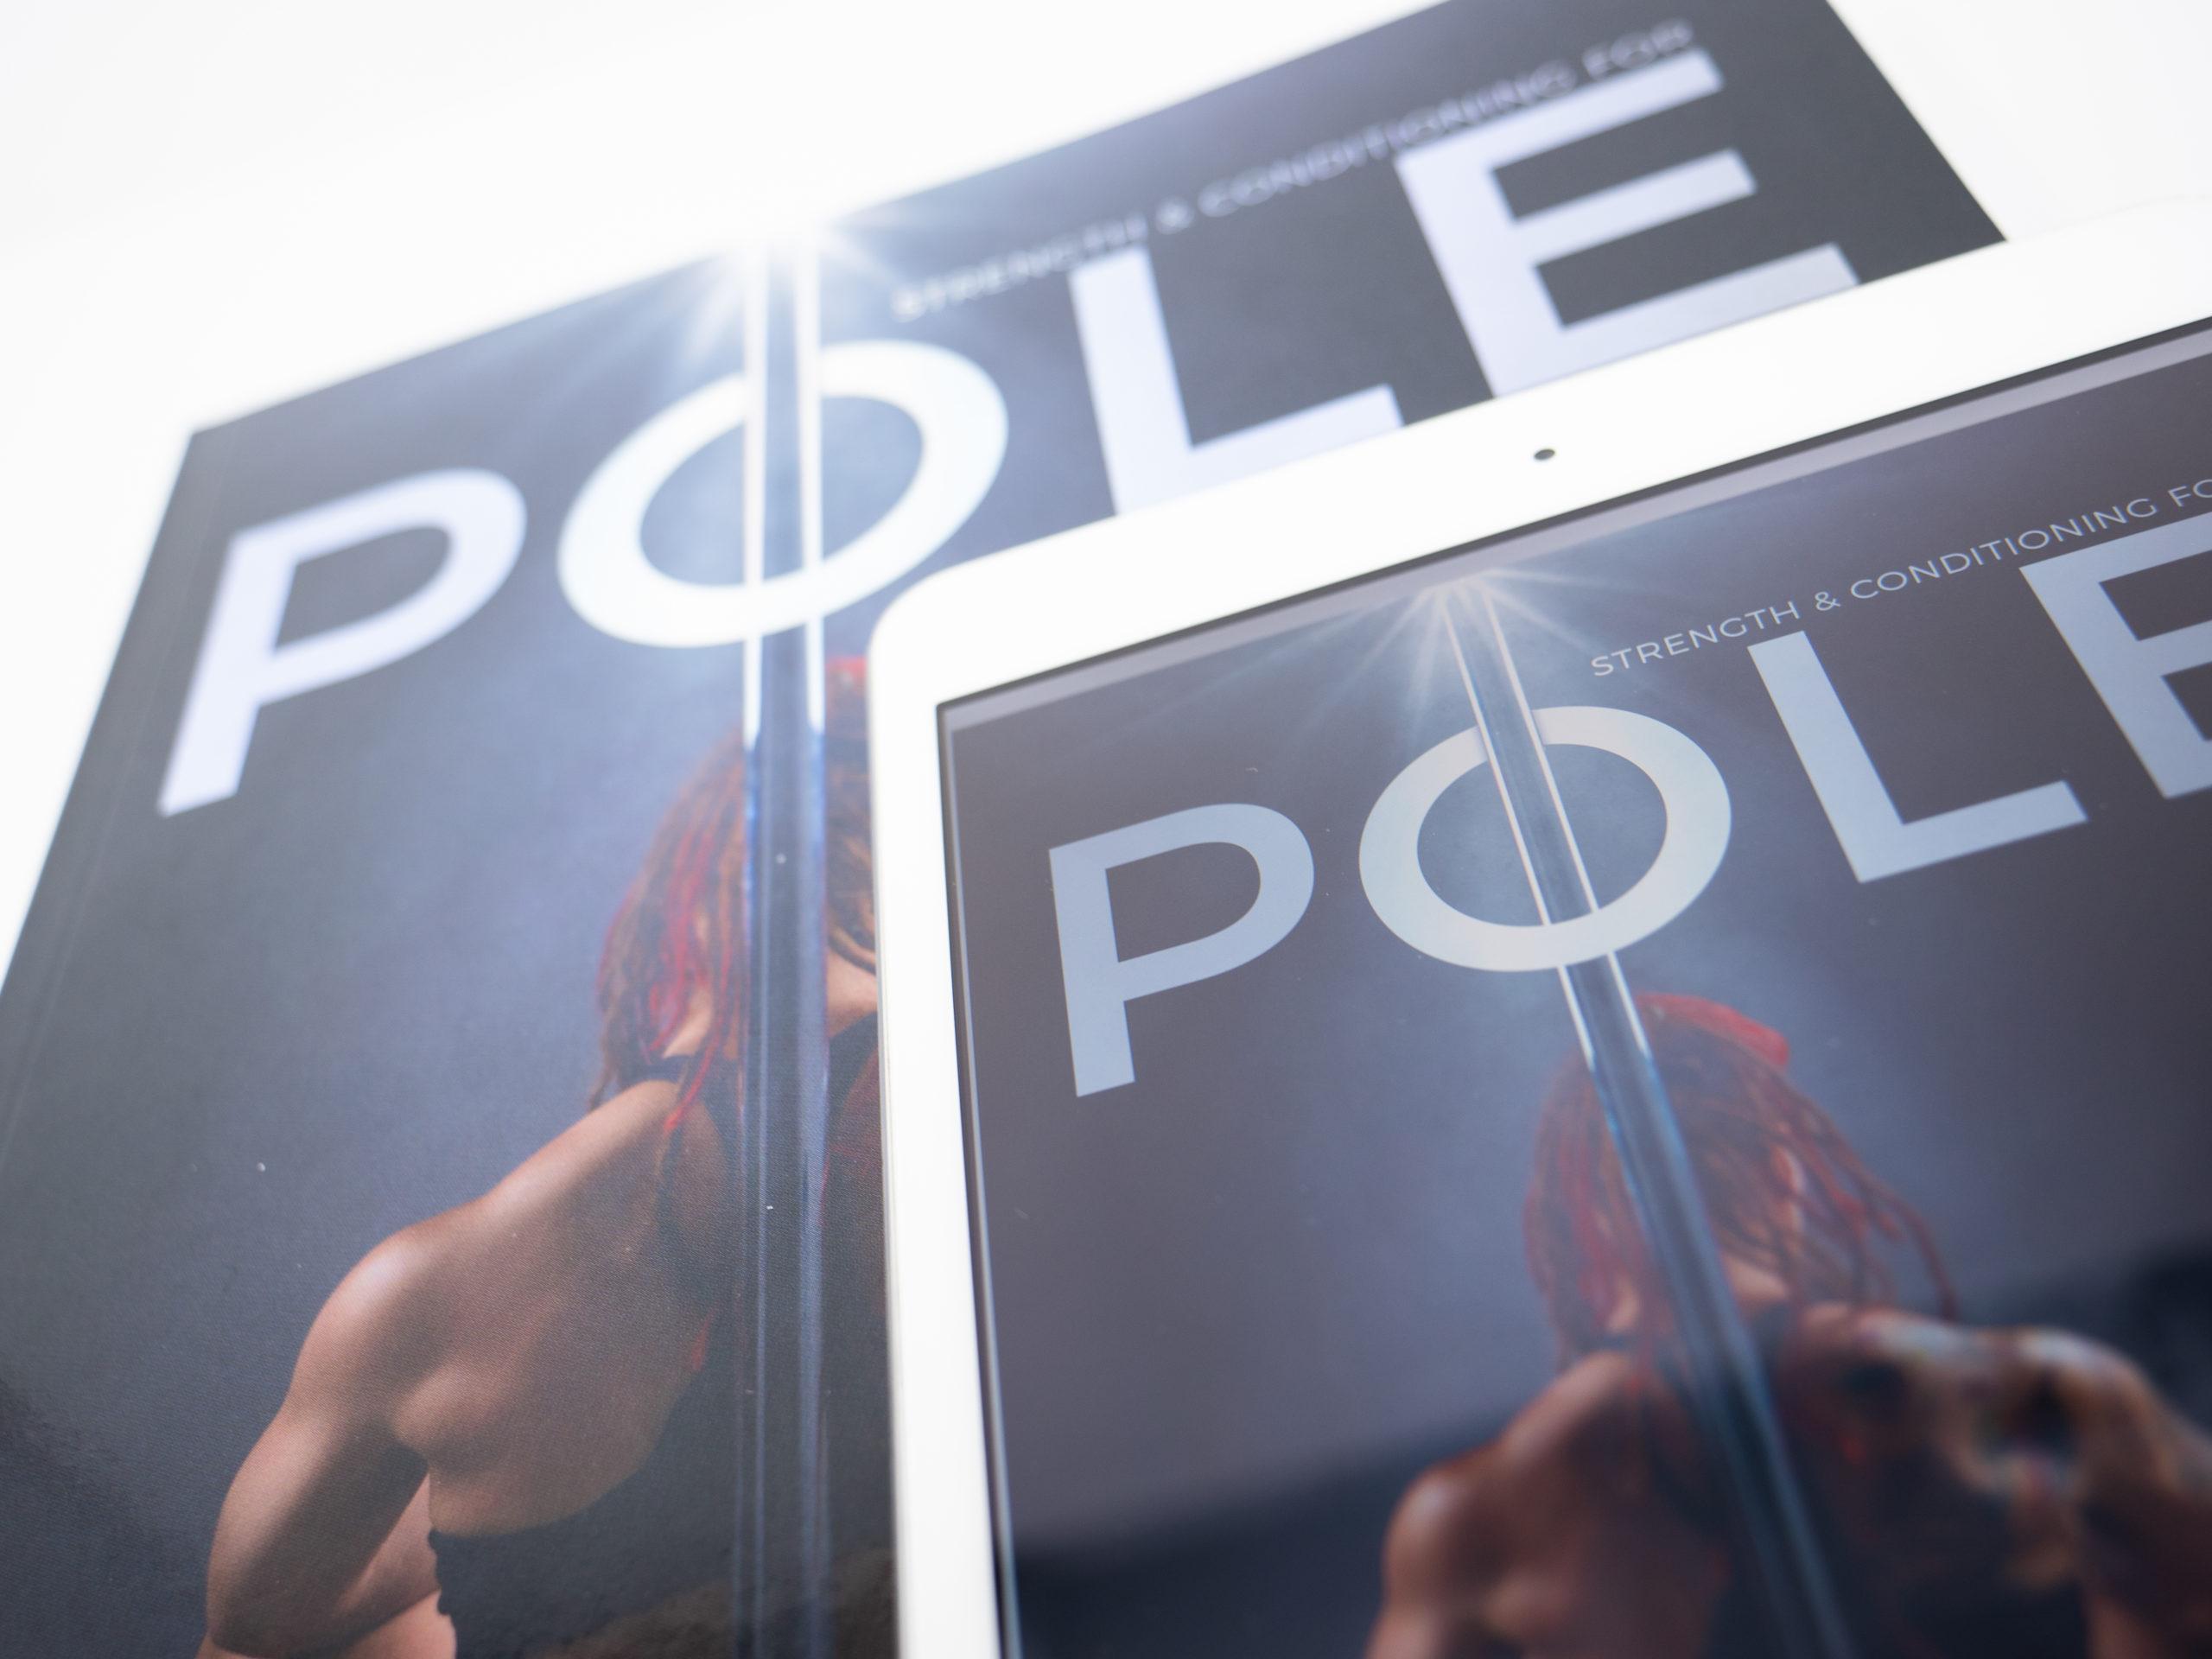 Close up pole book and ebook